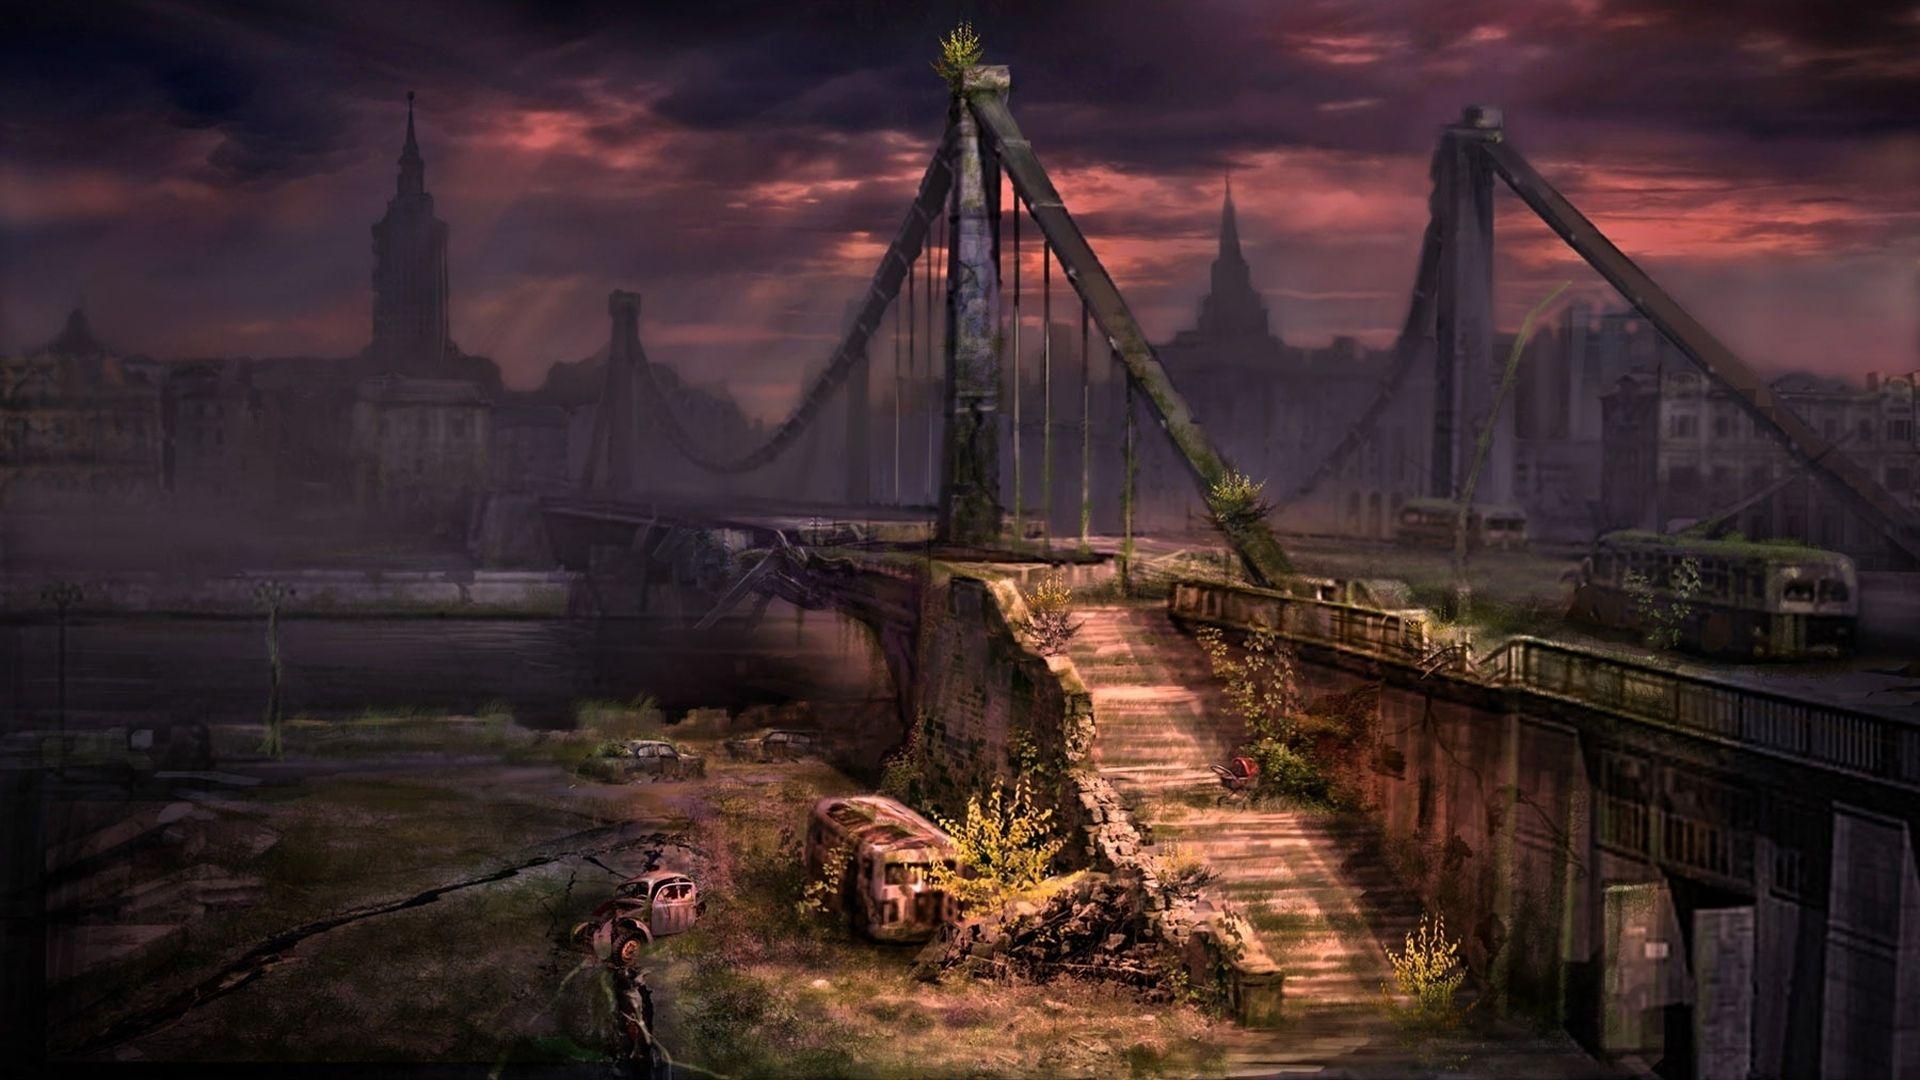 Download Apocalypse New York Wallpaper | Full HD Wallpapers | Apocalypse | Post apocalyptic art ...